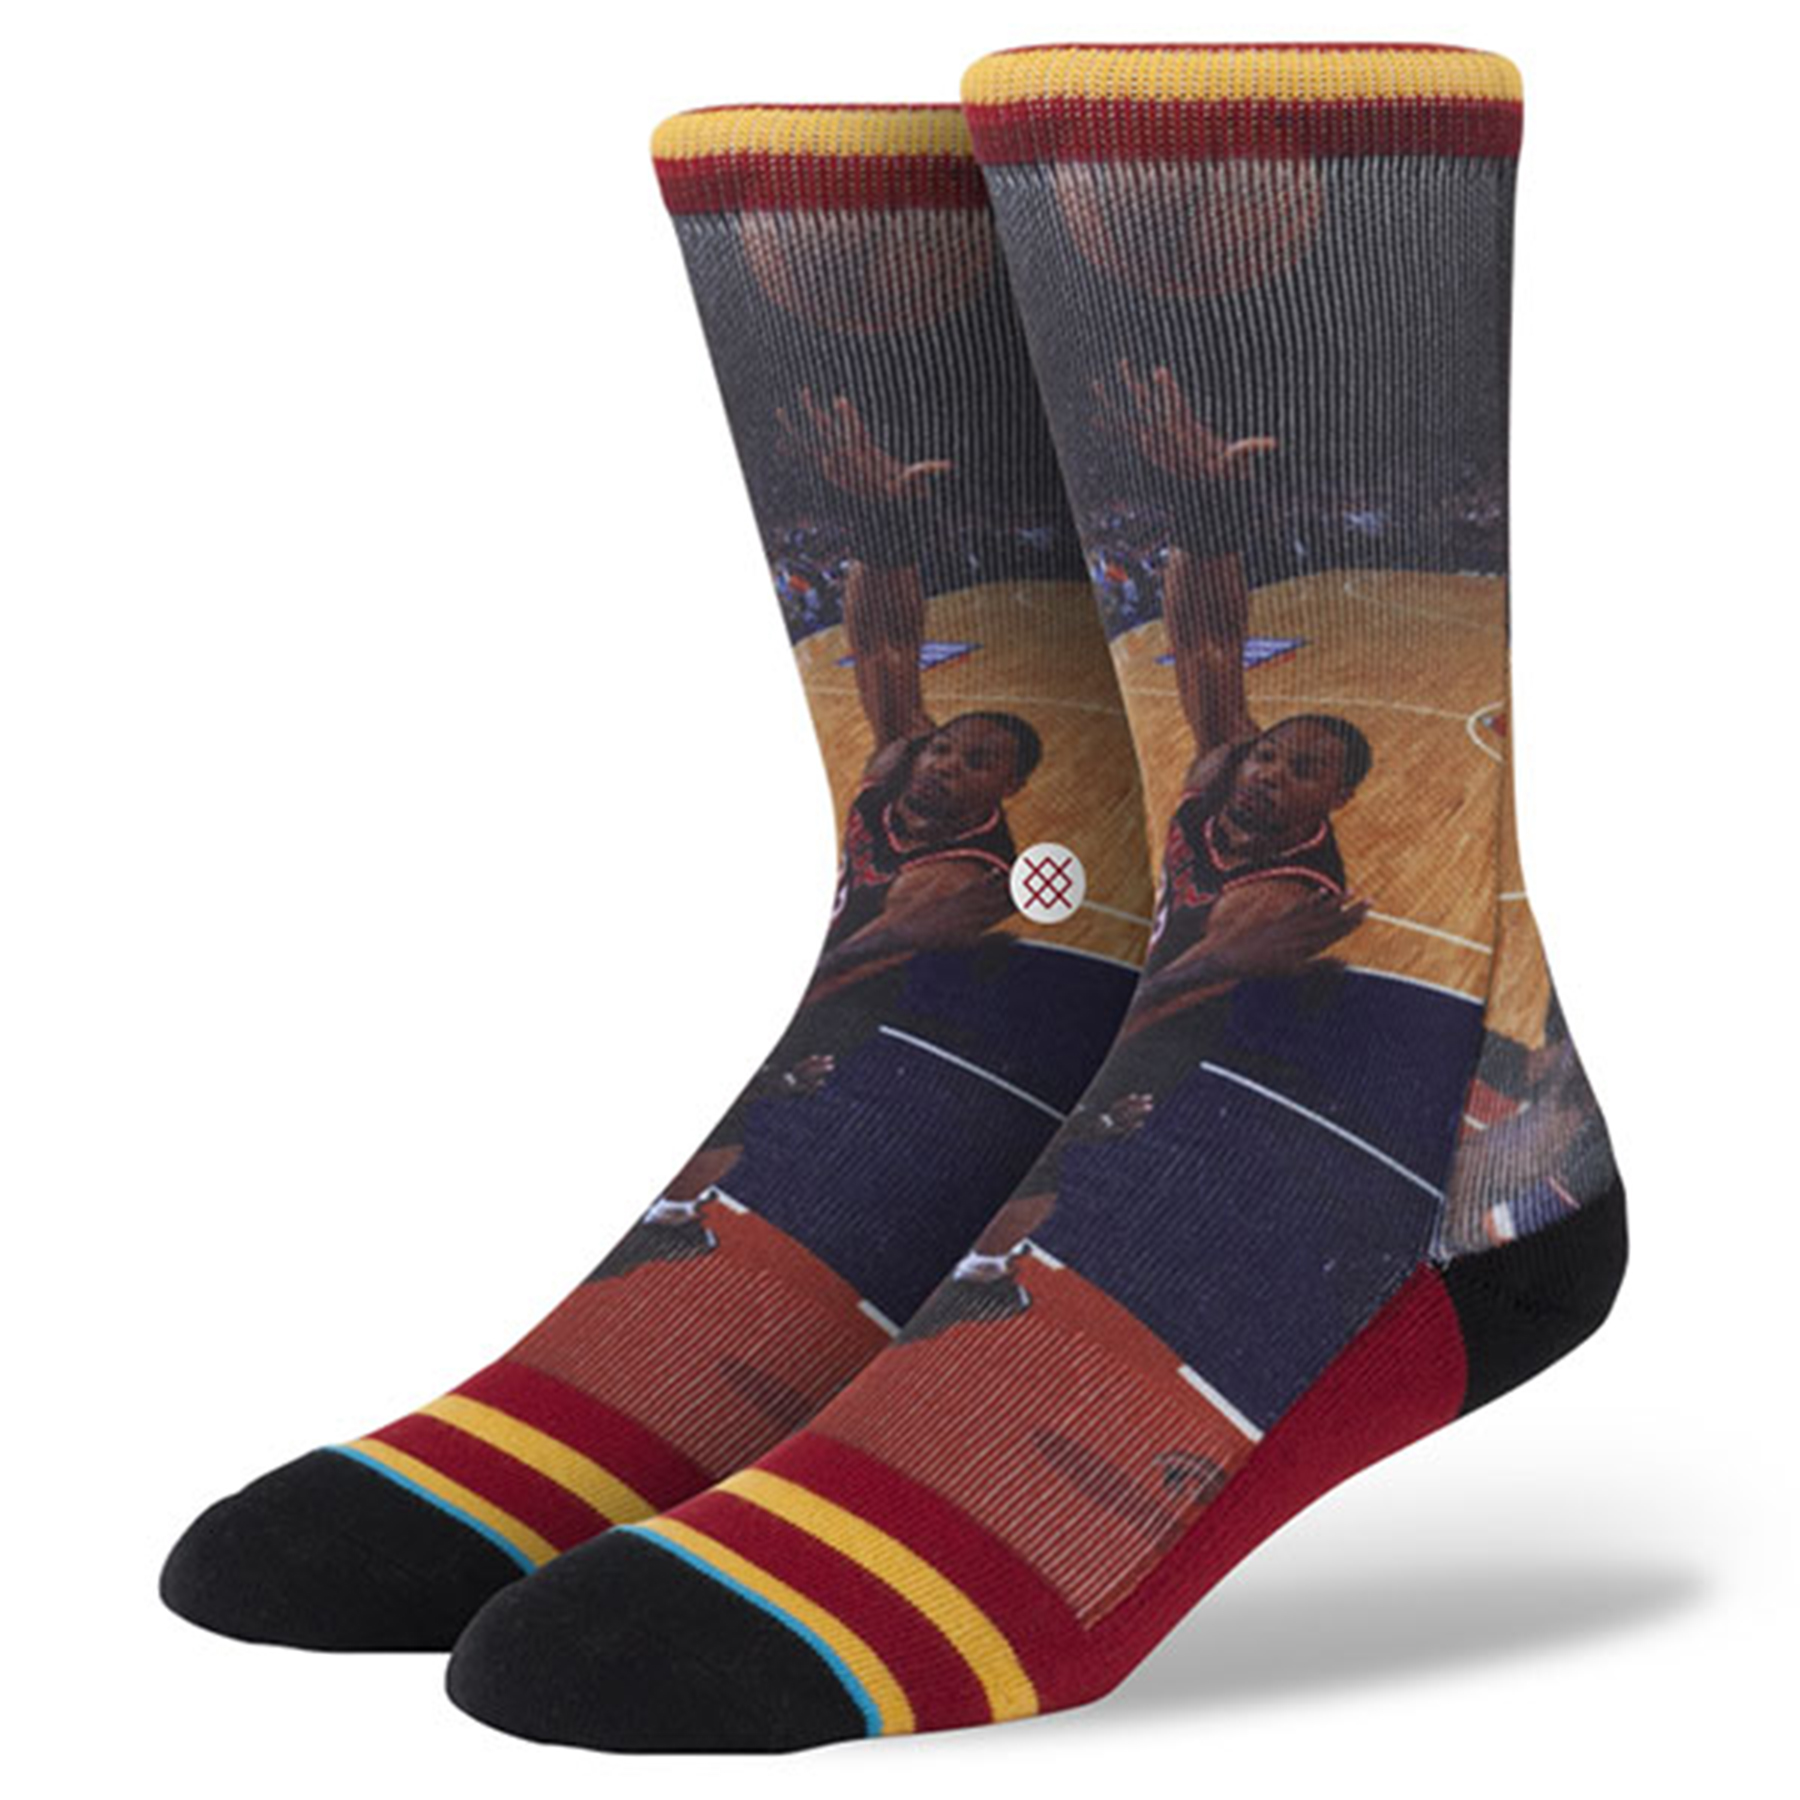 Miami Heat Stance Hardwood Classics Player Socks - Alonzo Mourning